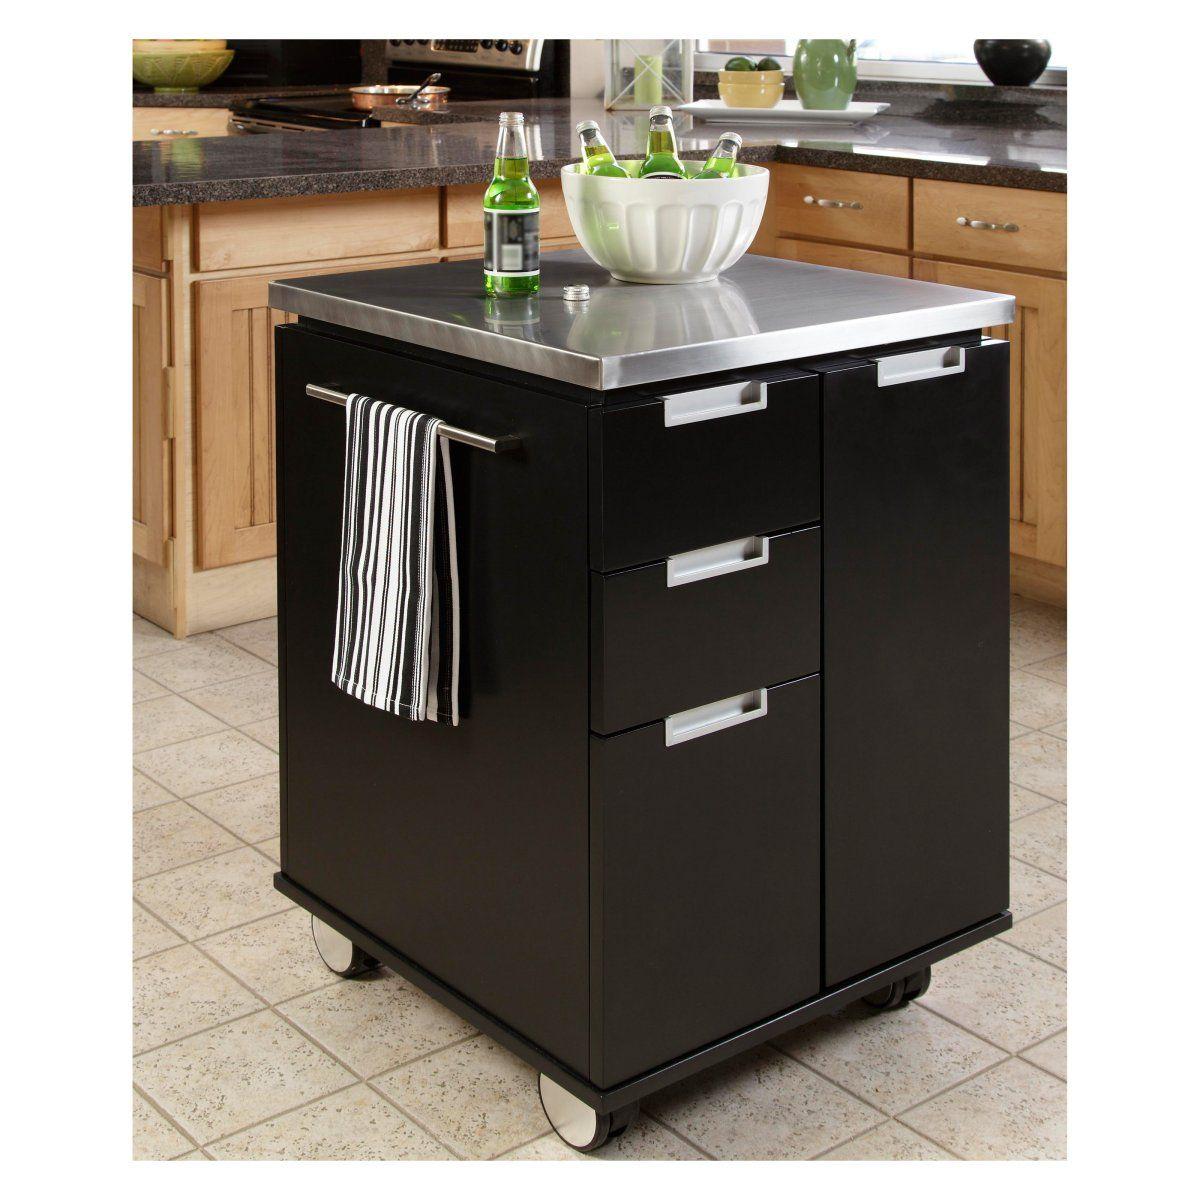 Black Kitchen island Cart Kitchen Trash Can Ideas Check